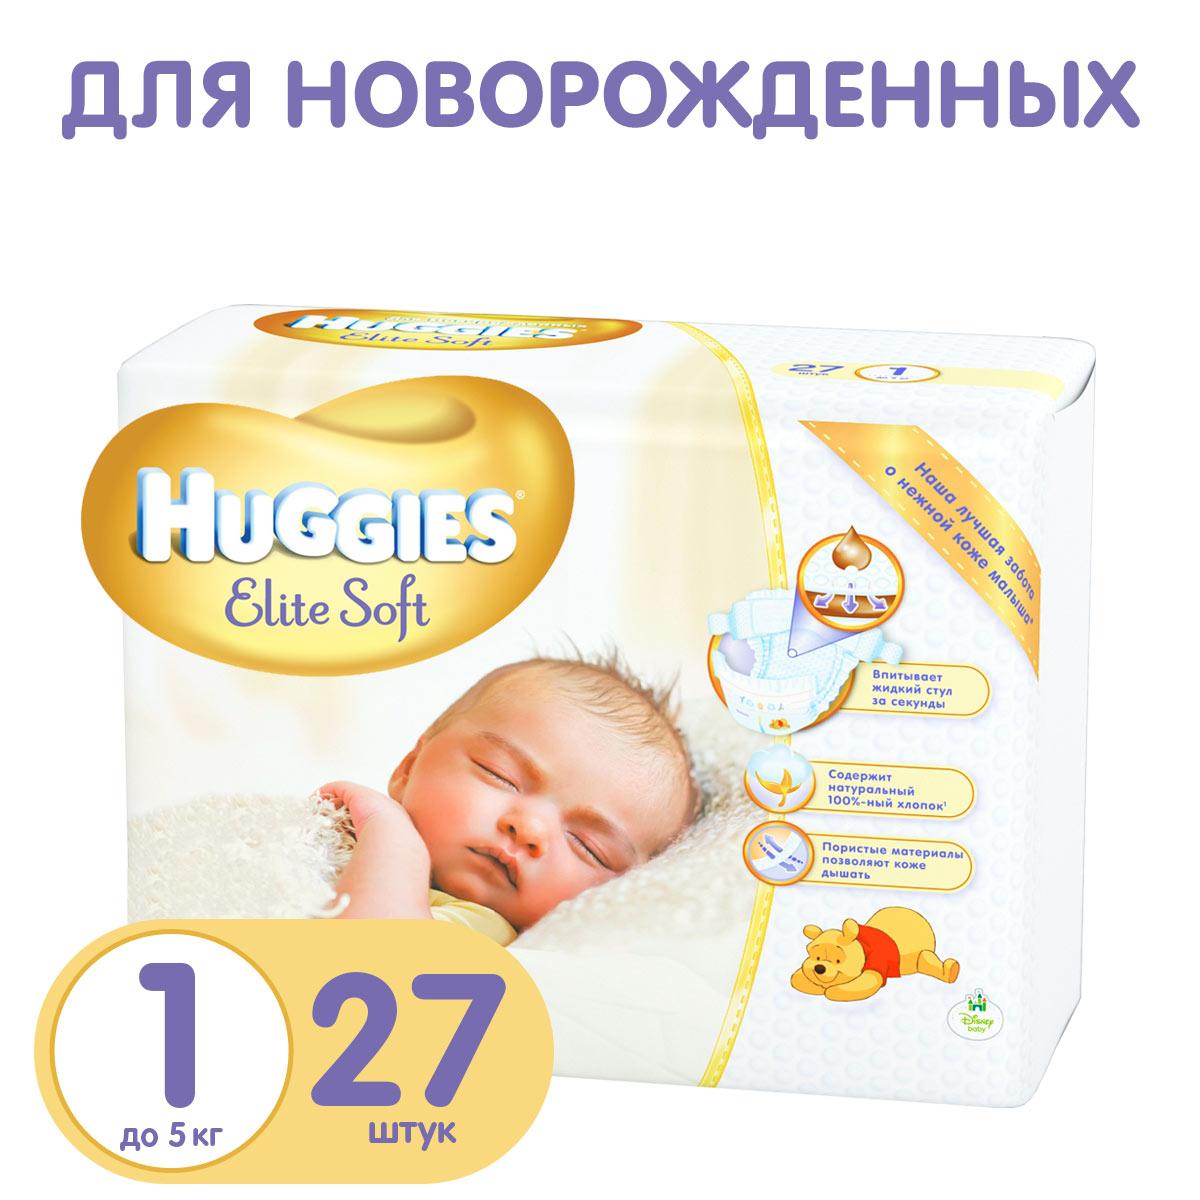 Подгузники Huggies Elite Soft Conv Pack до 5 кг (27 шт) Размер 1<br>